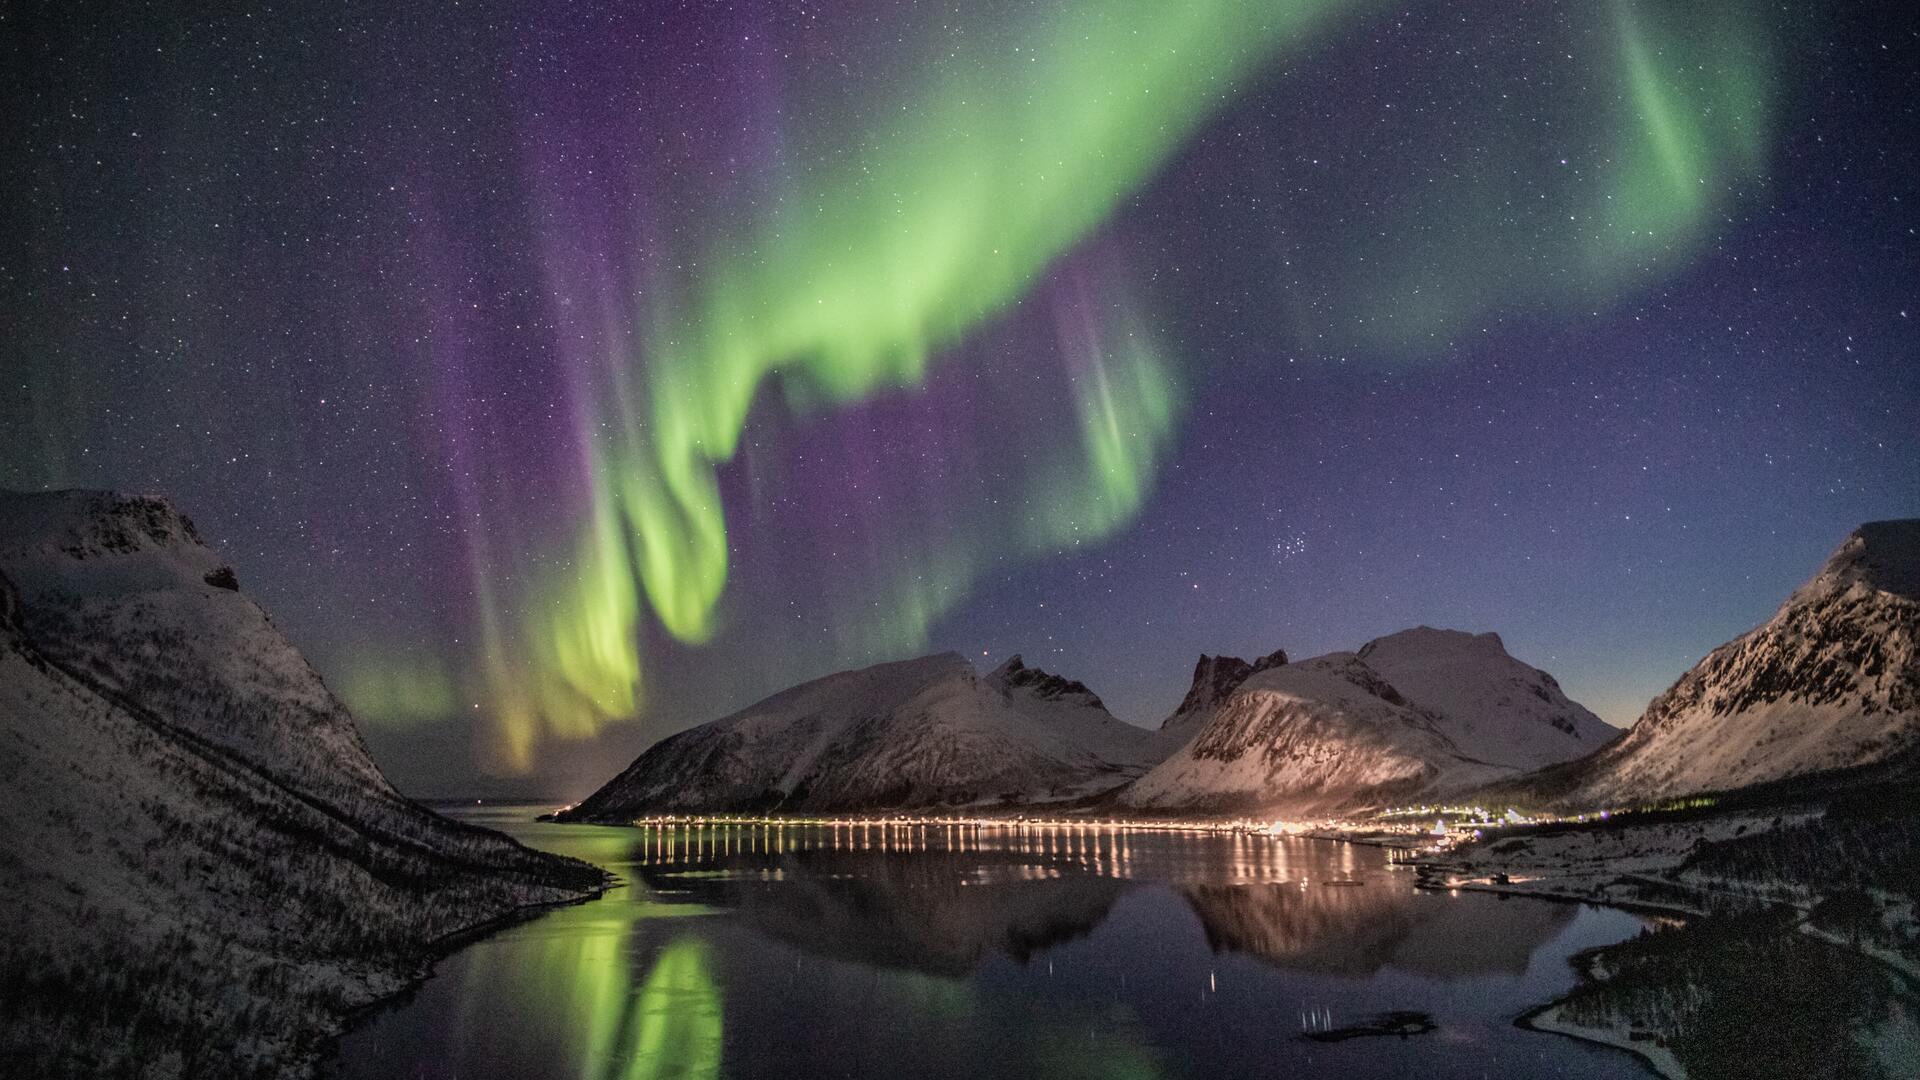 aurora-borealis-lake-houses-evening-5k-80.jpg